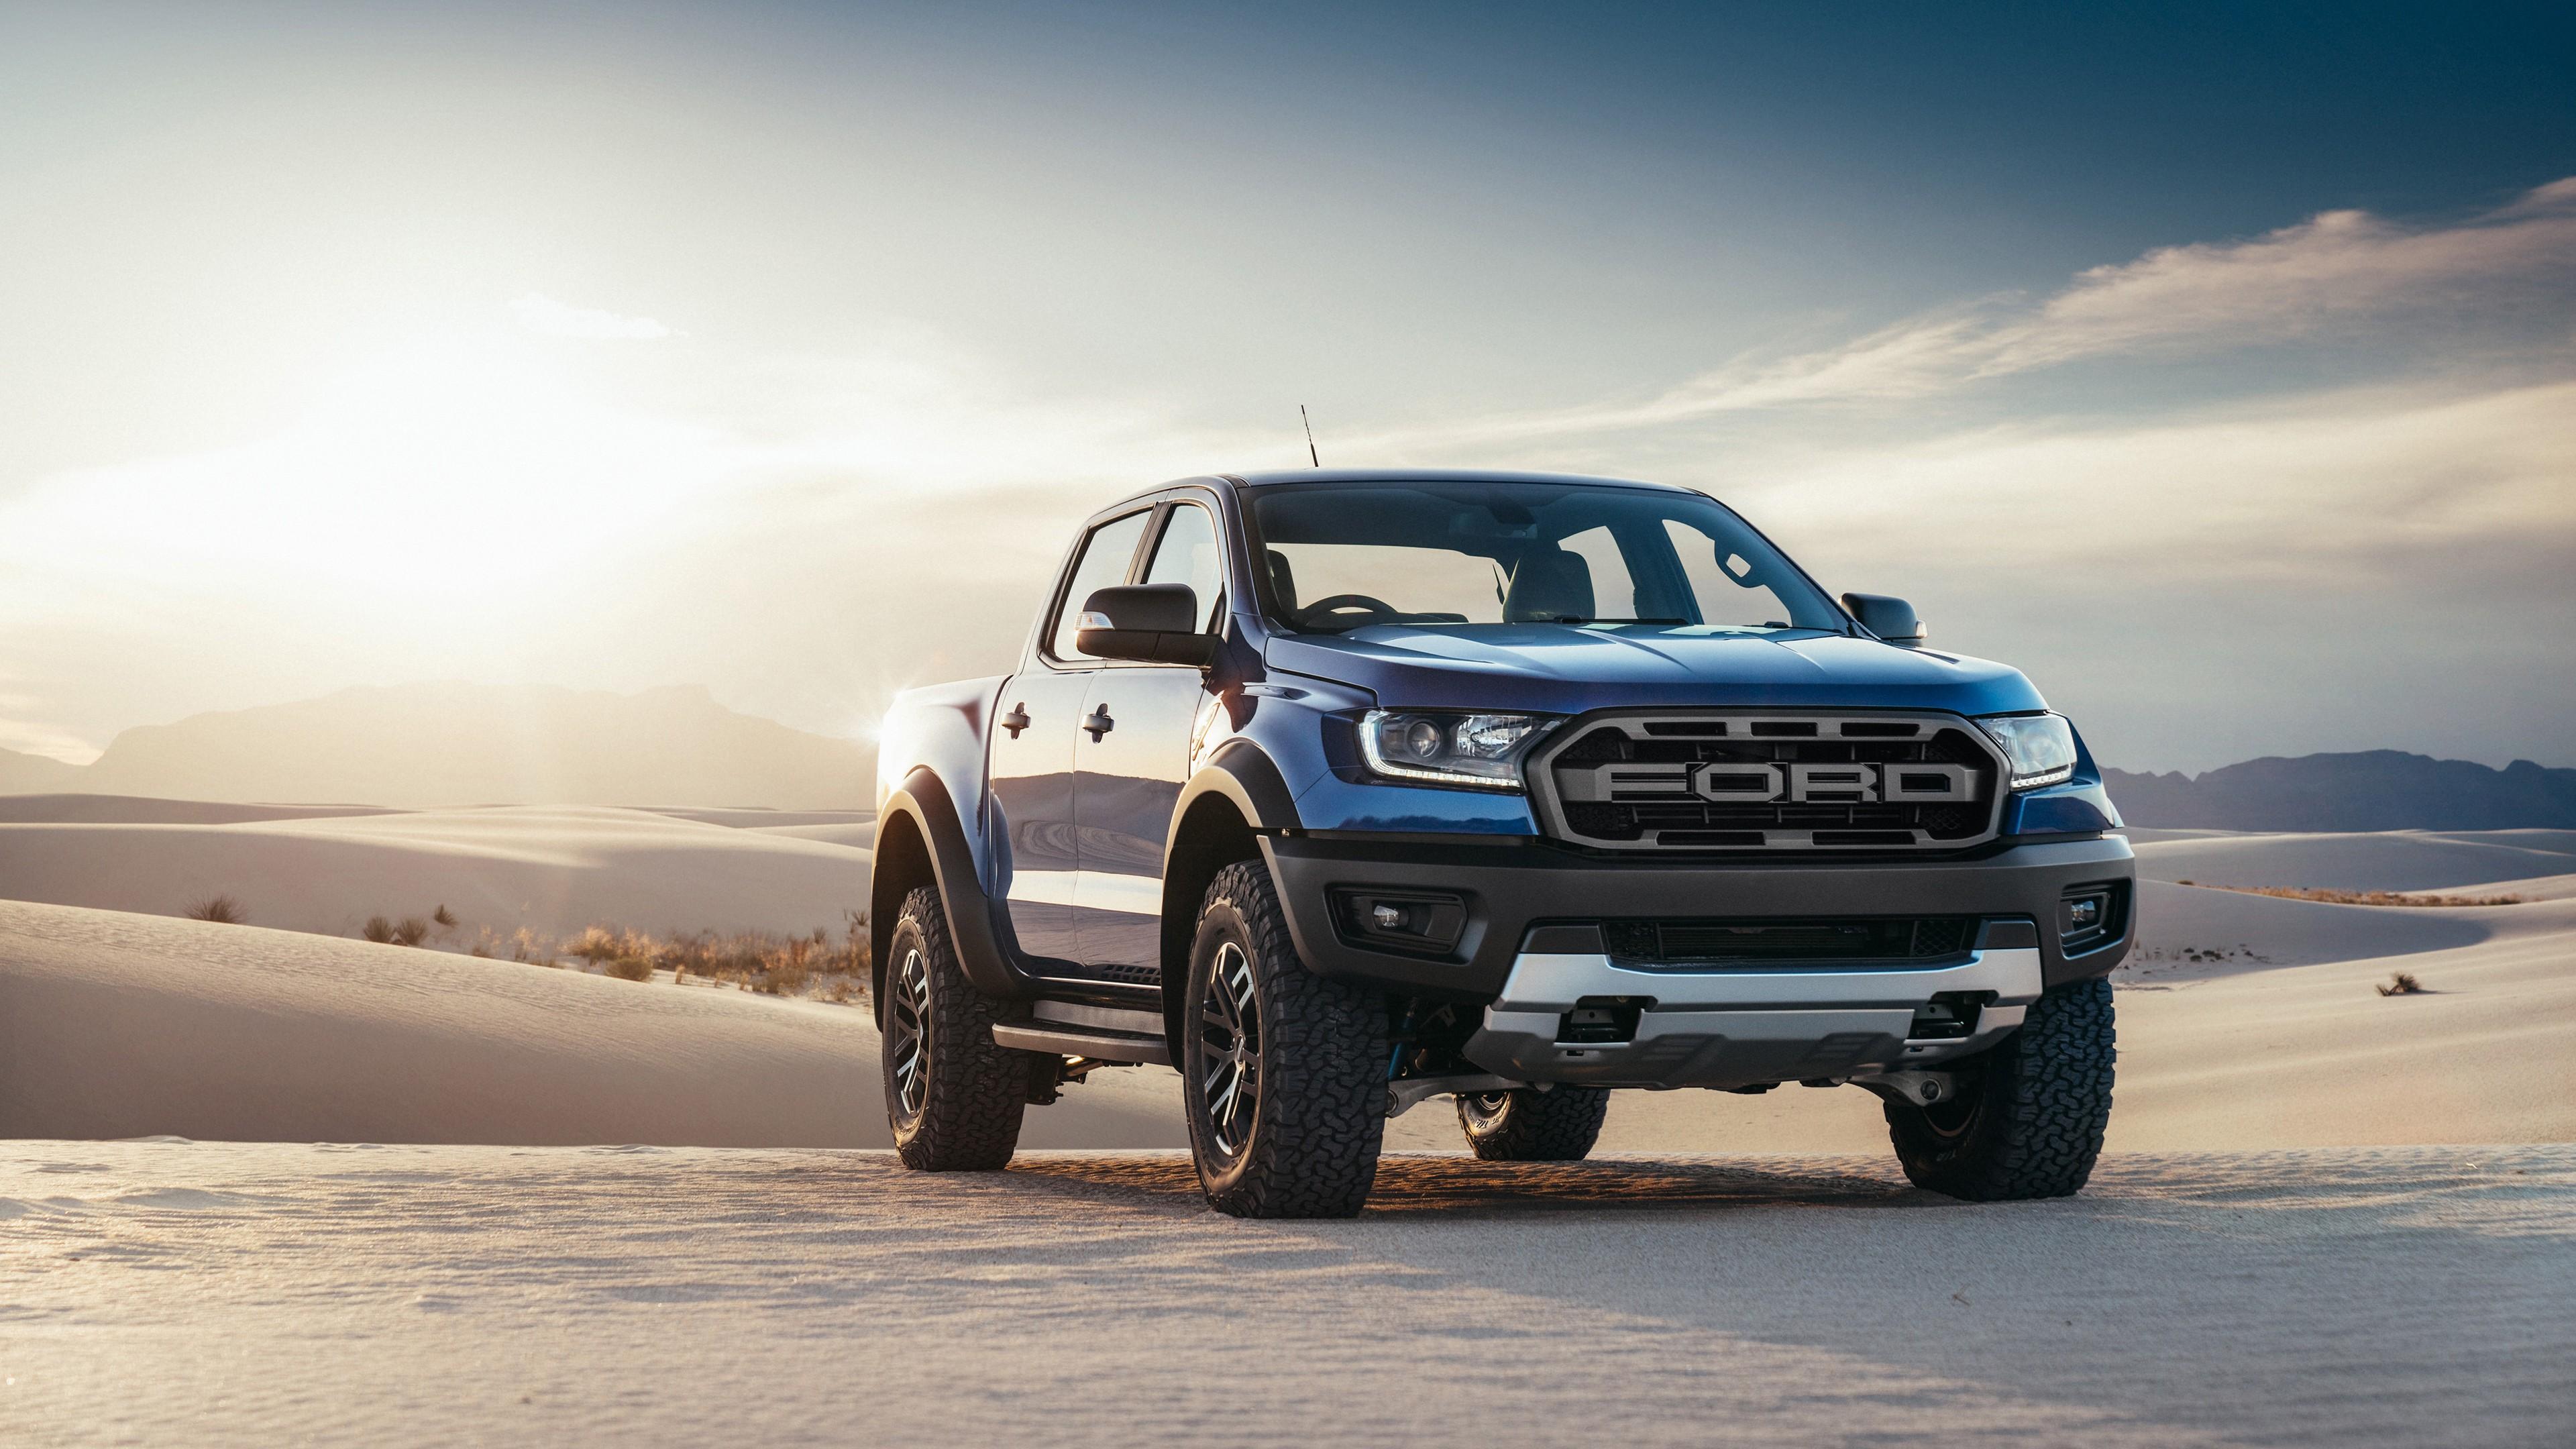 Ford Raptor Interior >> 2019 Ford Ranger Raptor 4K Wallpaper | HD Car Wallpapers | ID #9559